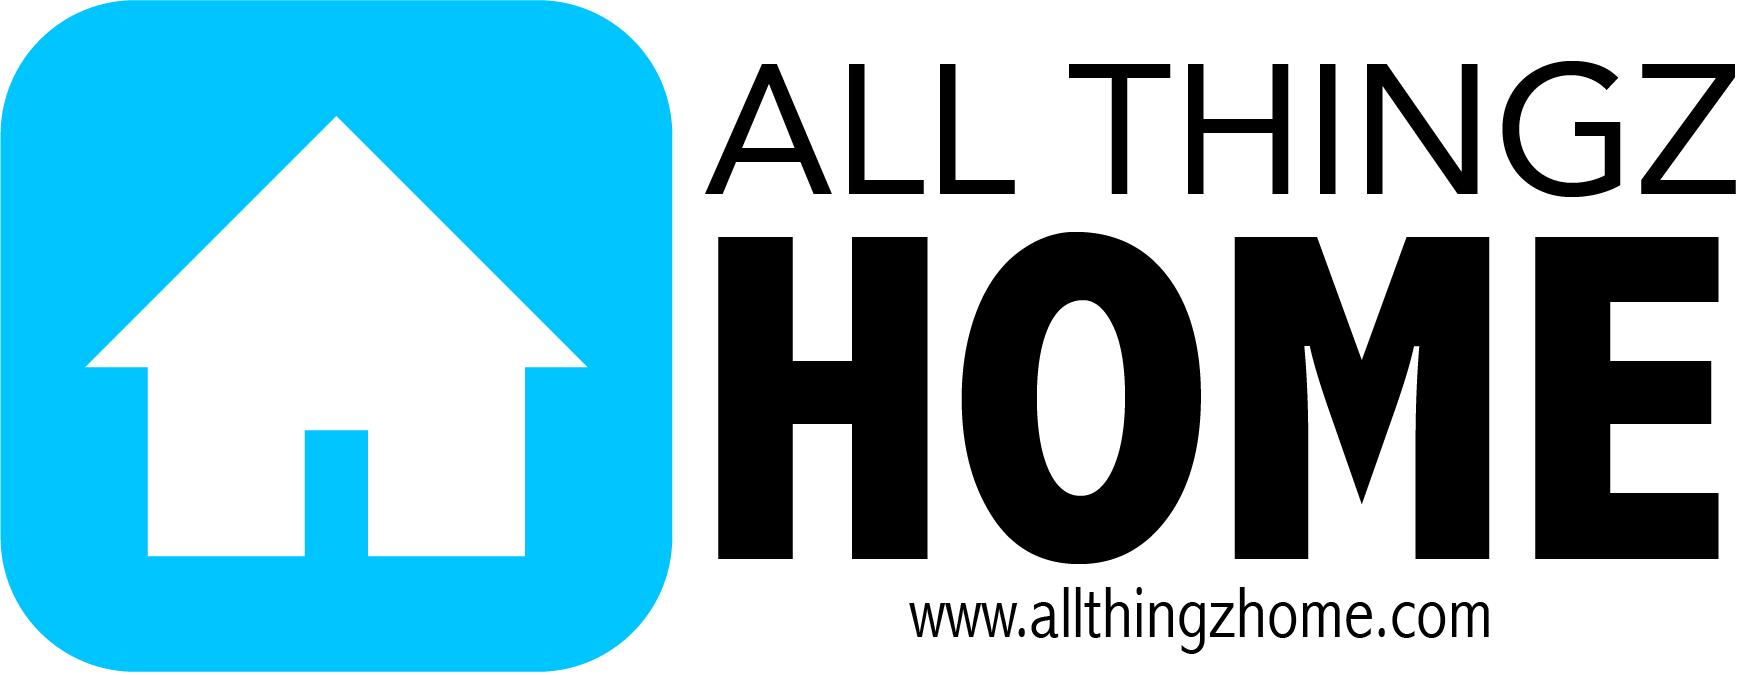 ATH logo2.png